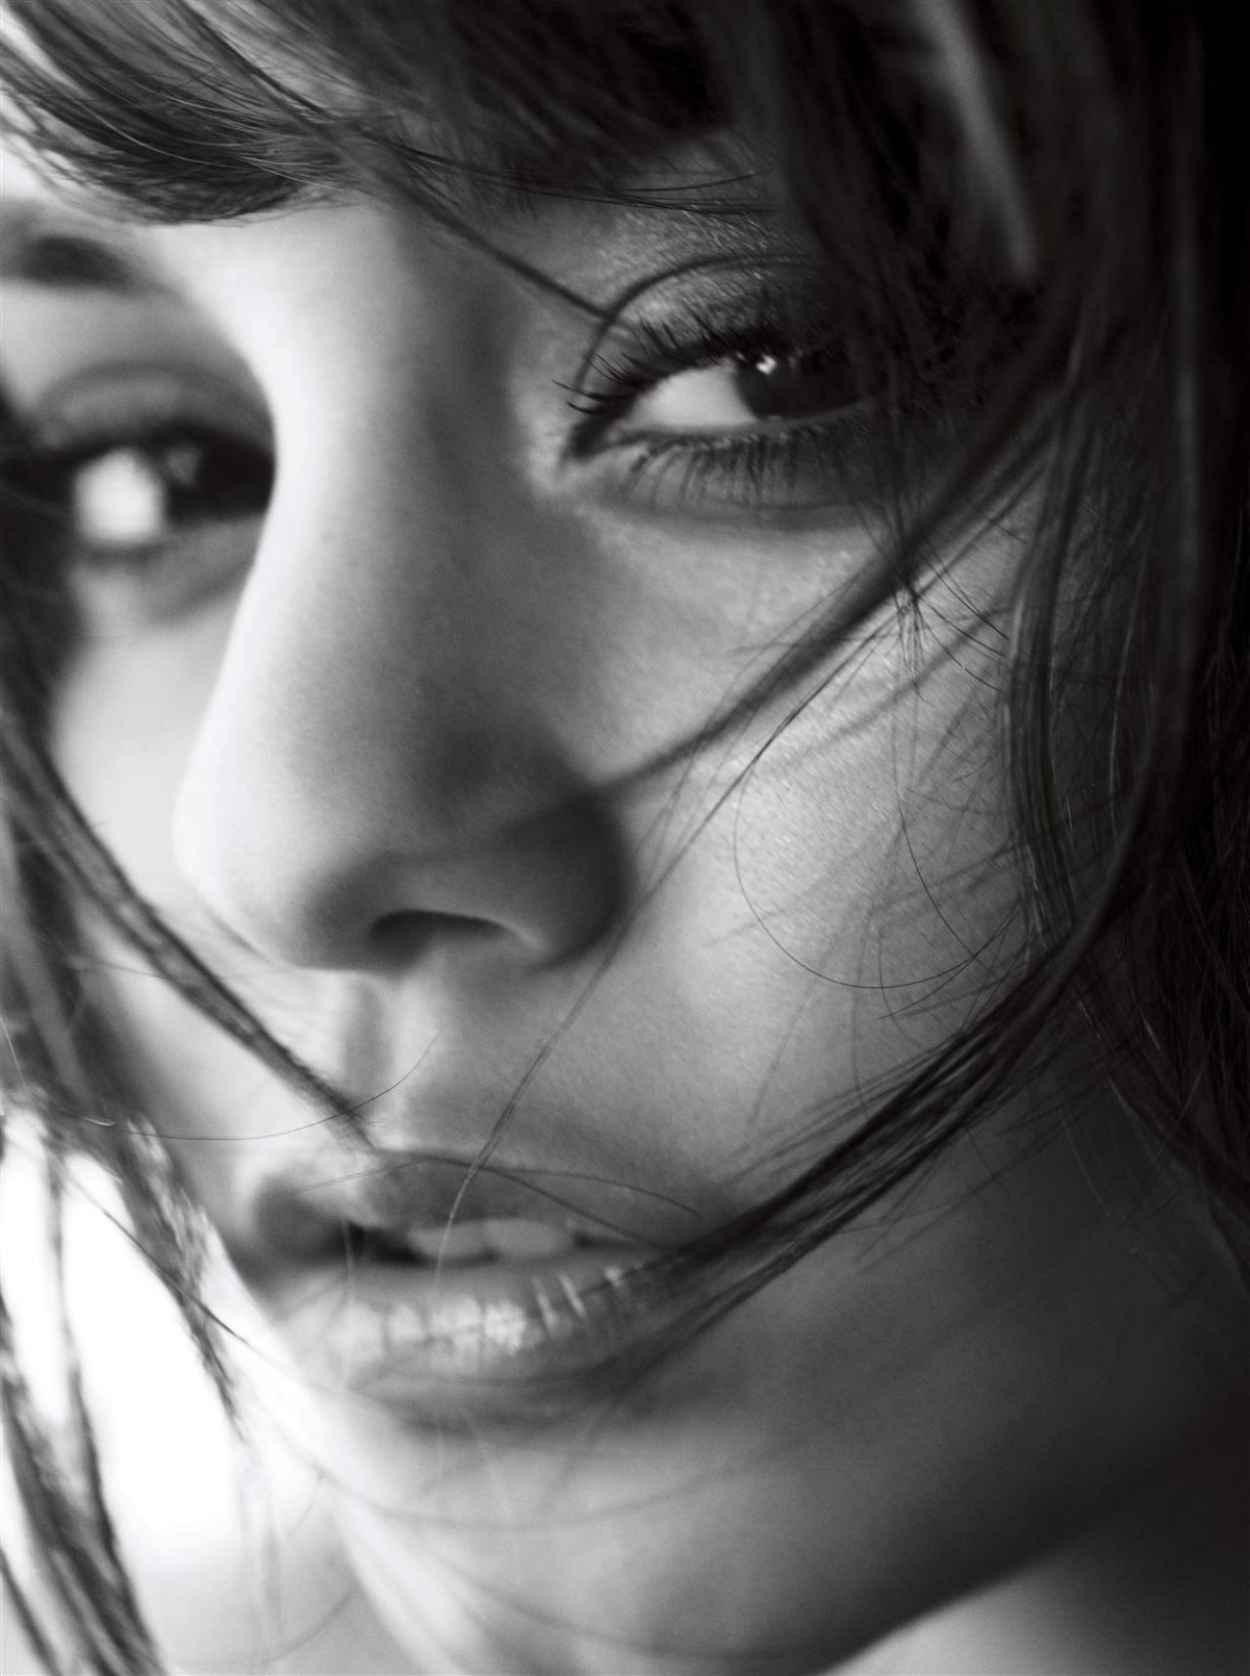 Vanessa Hudgens Photoshoot for ALLURE Magazine - October 2009-4